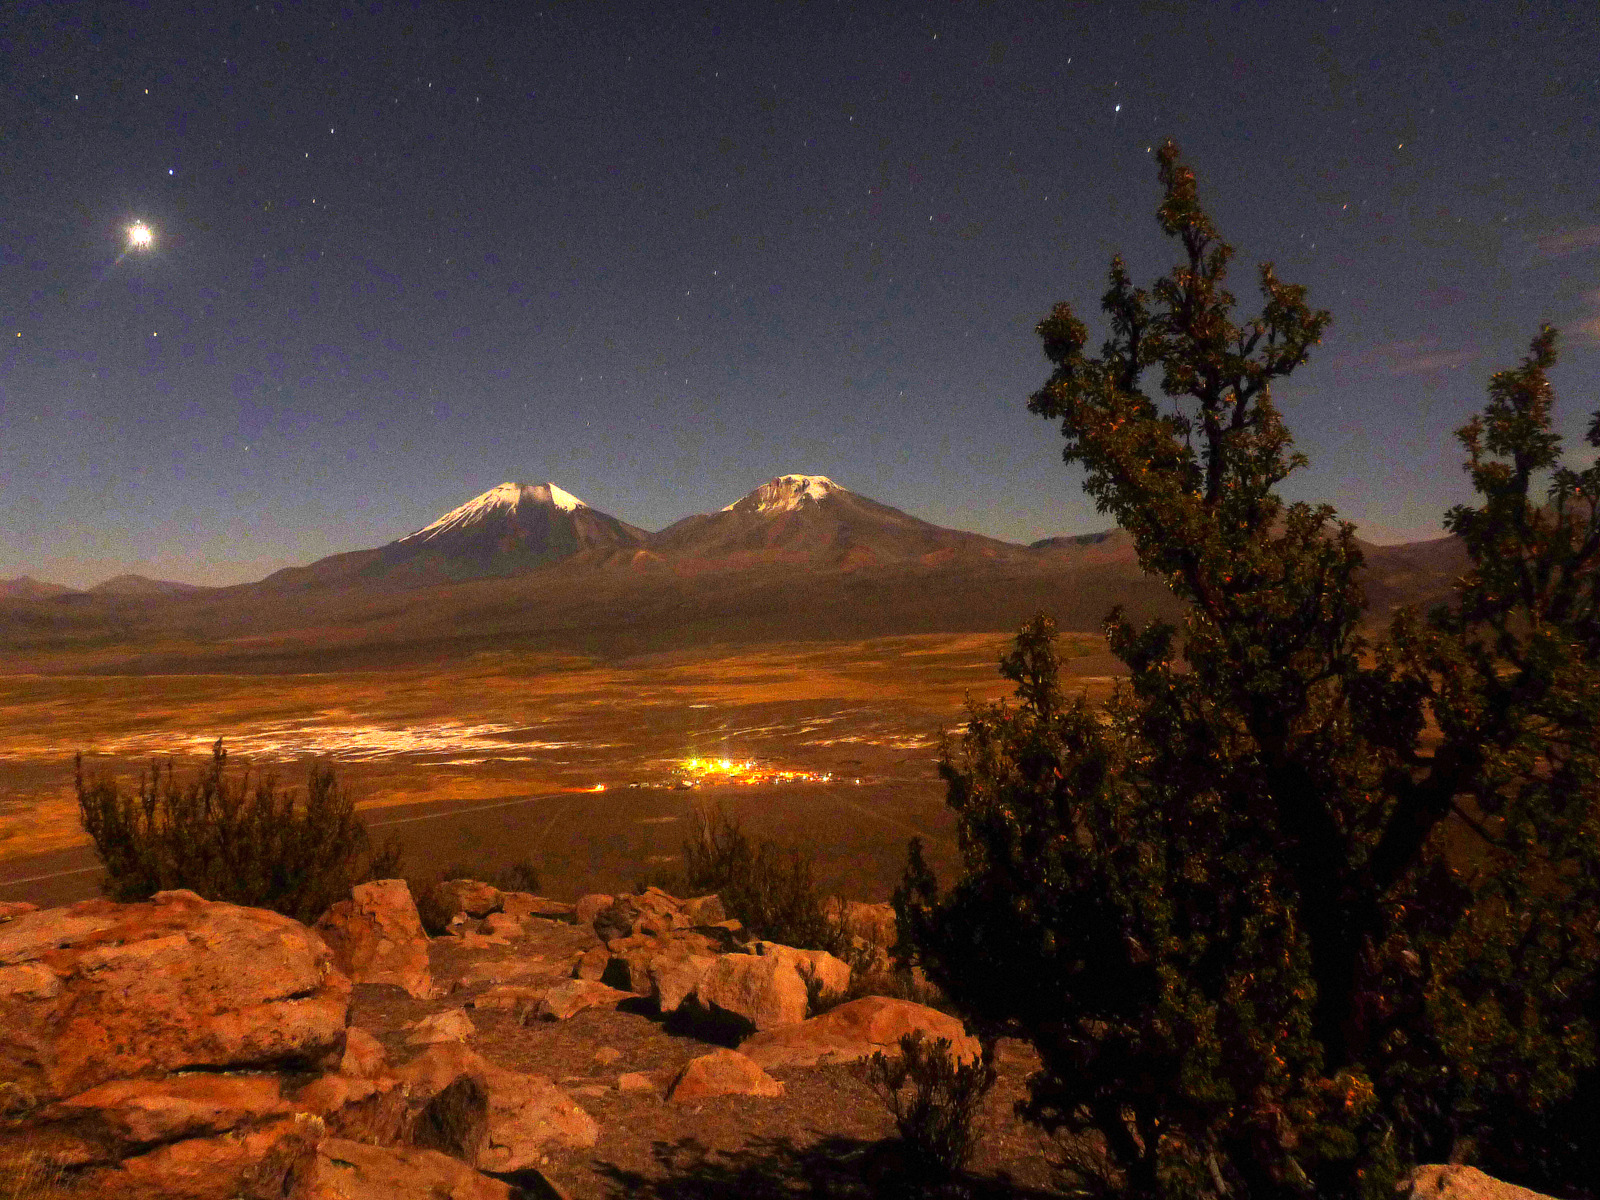 Parinakhota and Pomerape by night